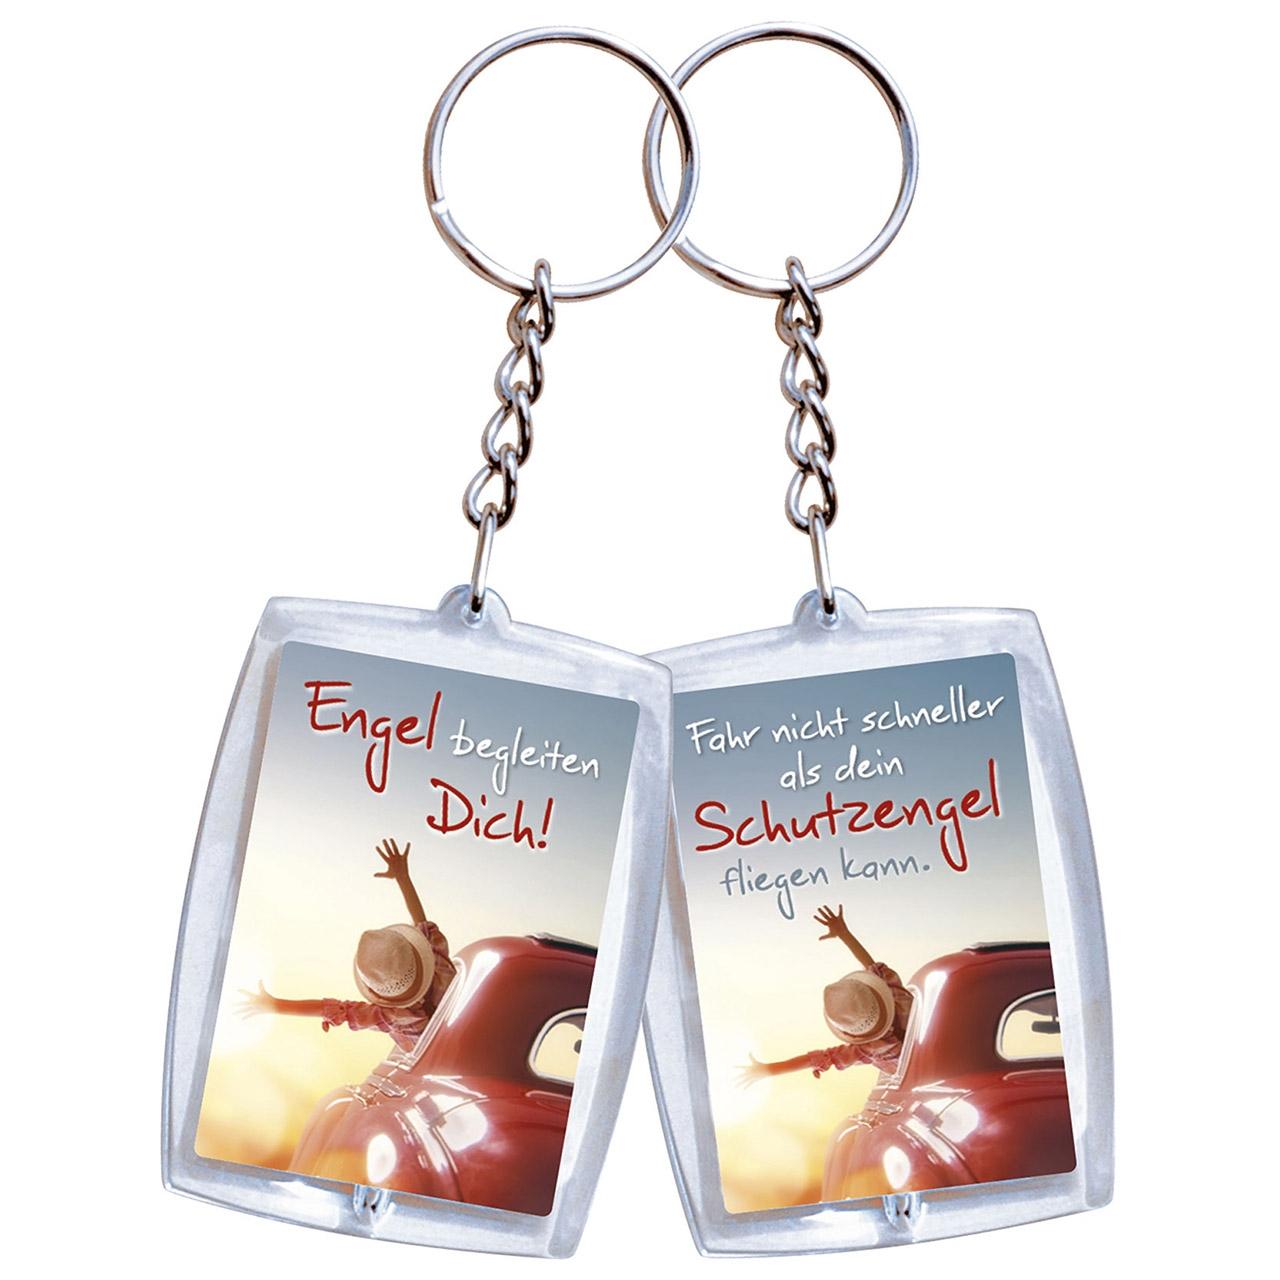 Schlüsselanhänger: Engel begleiten dich!